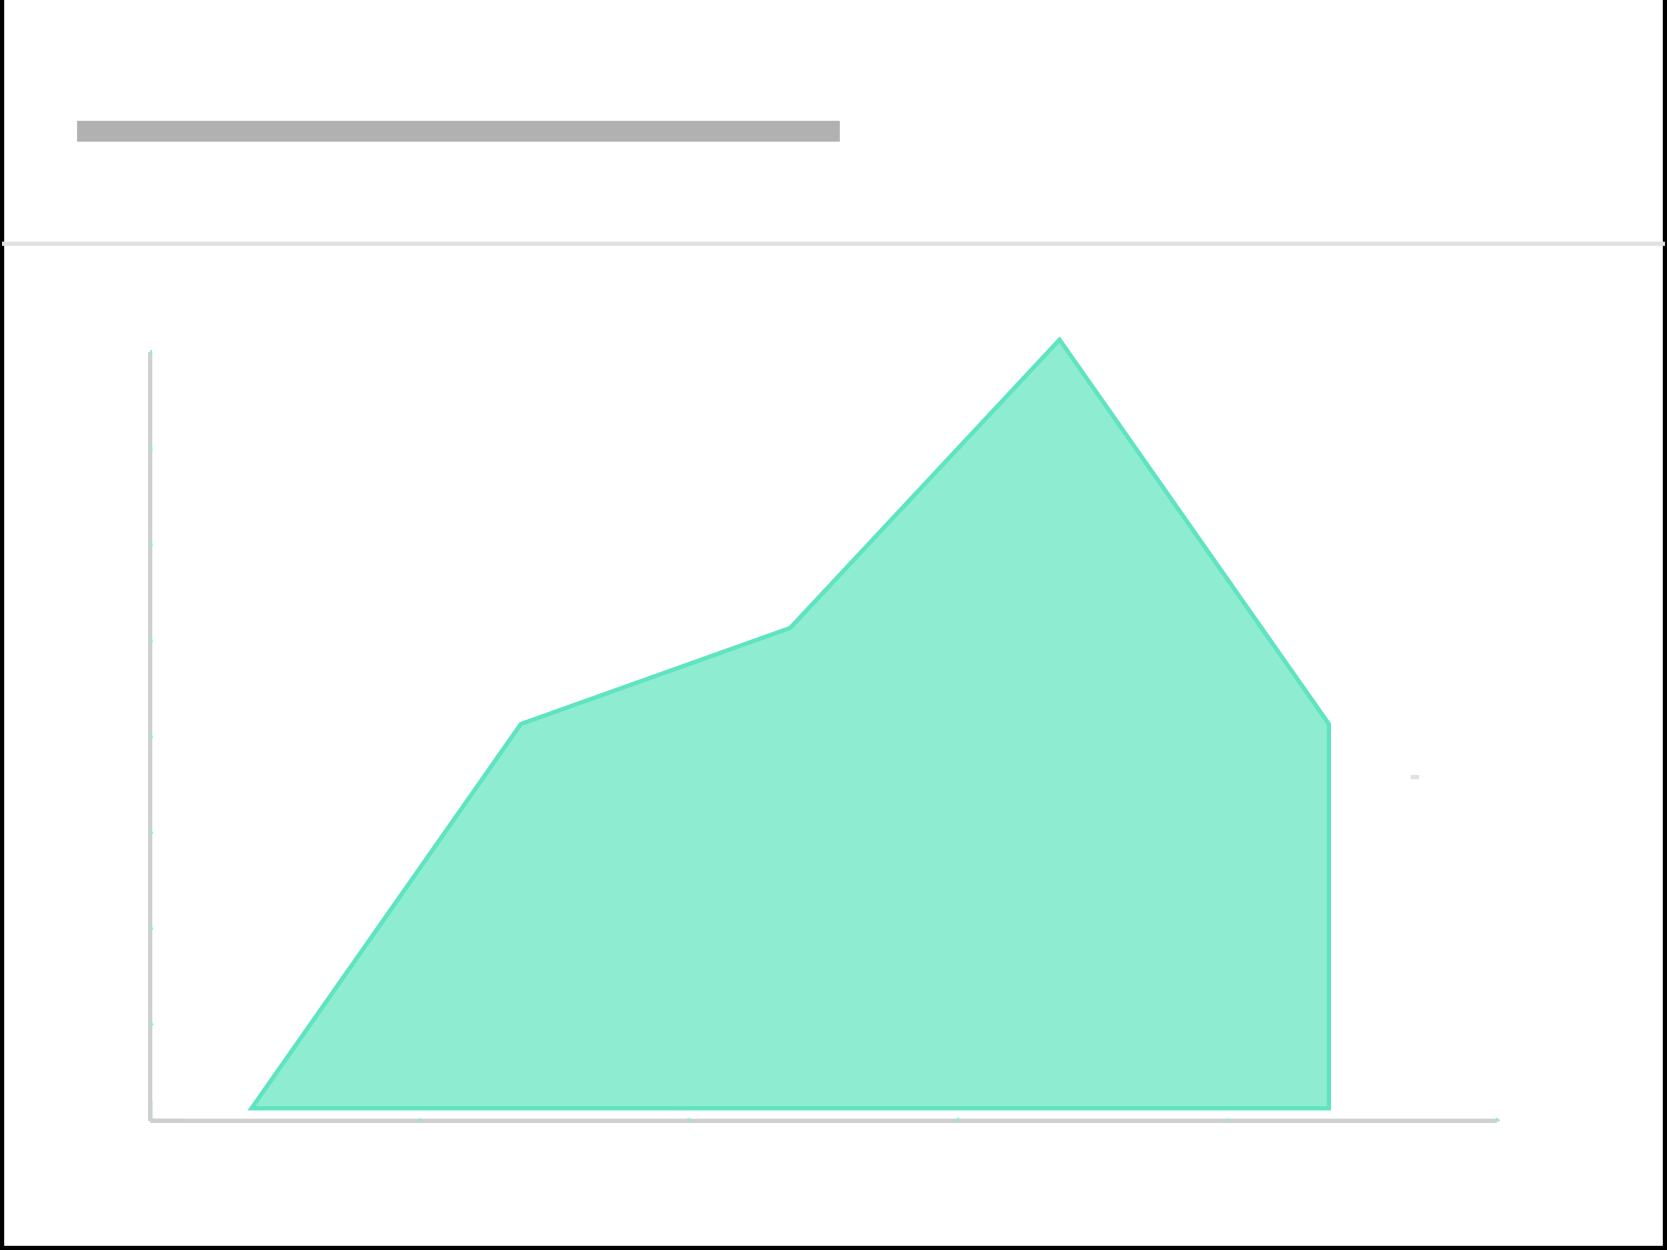 Patturn Area Line Graph